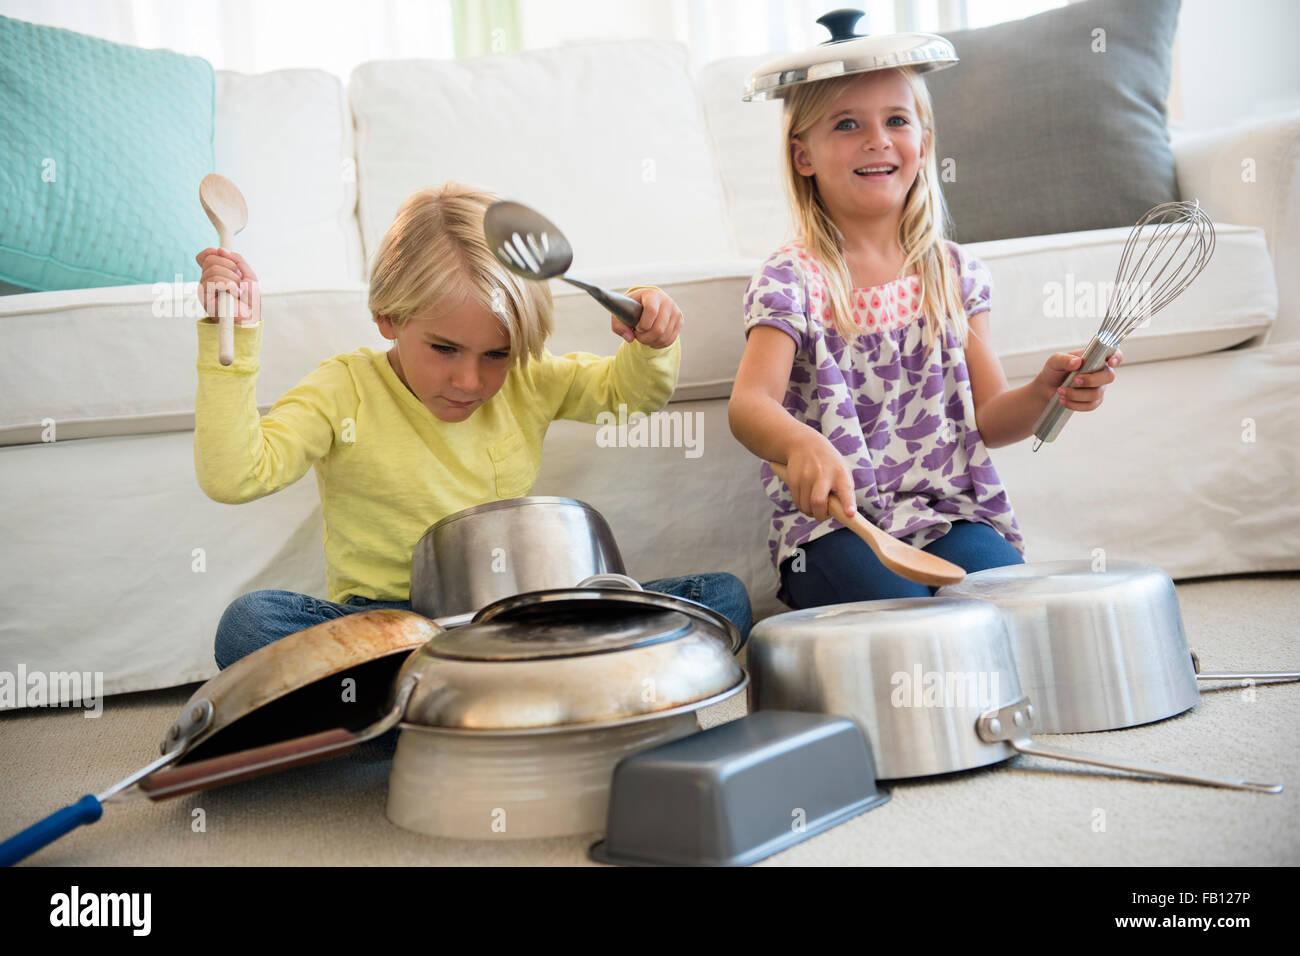 Boy (4-5) and girl (6-7) playing on pots on living room - Stock Image